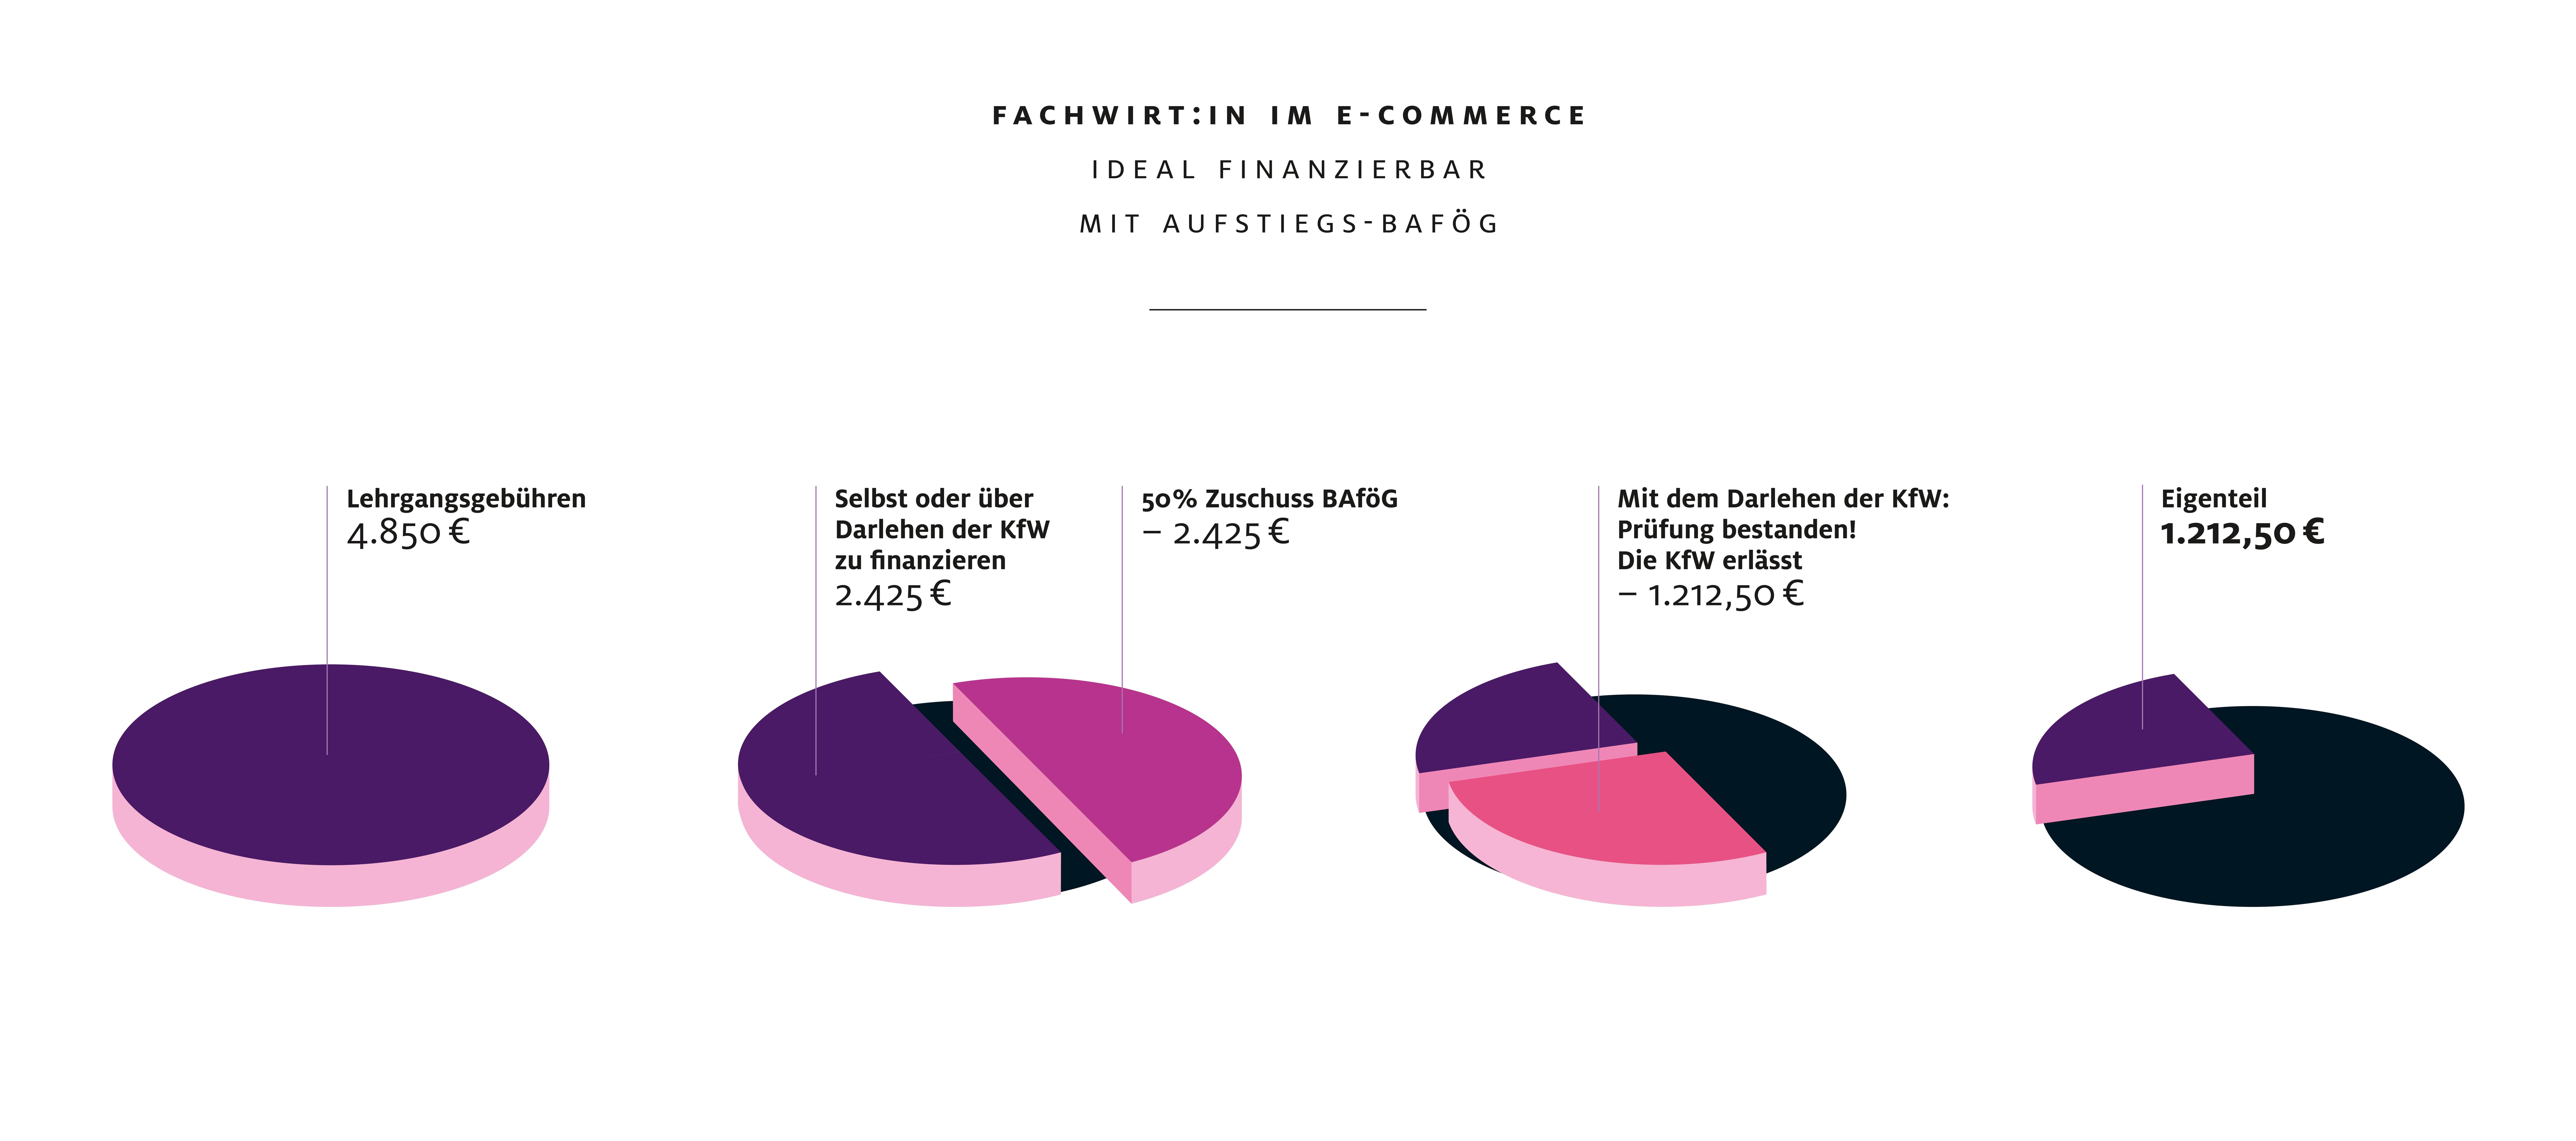 Grafik Fachwirt E-Commerce Finanzierung